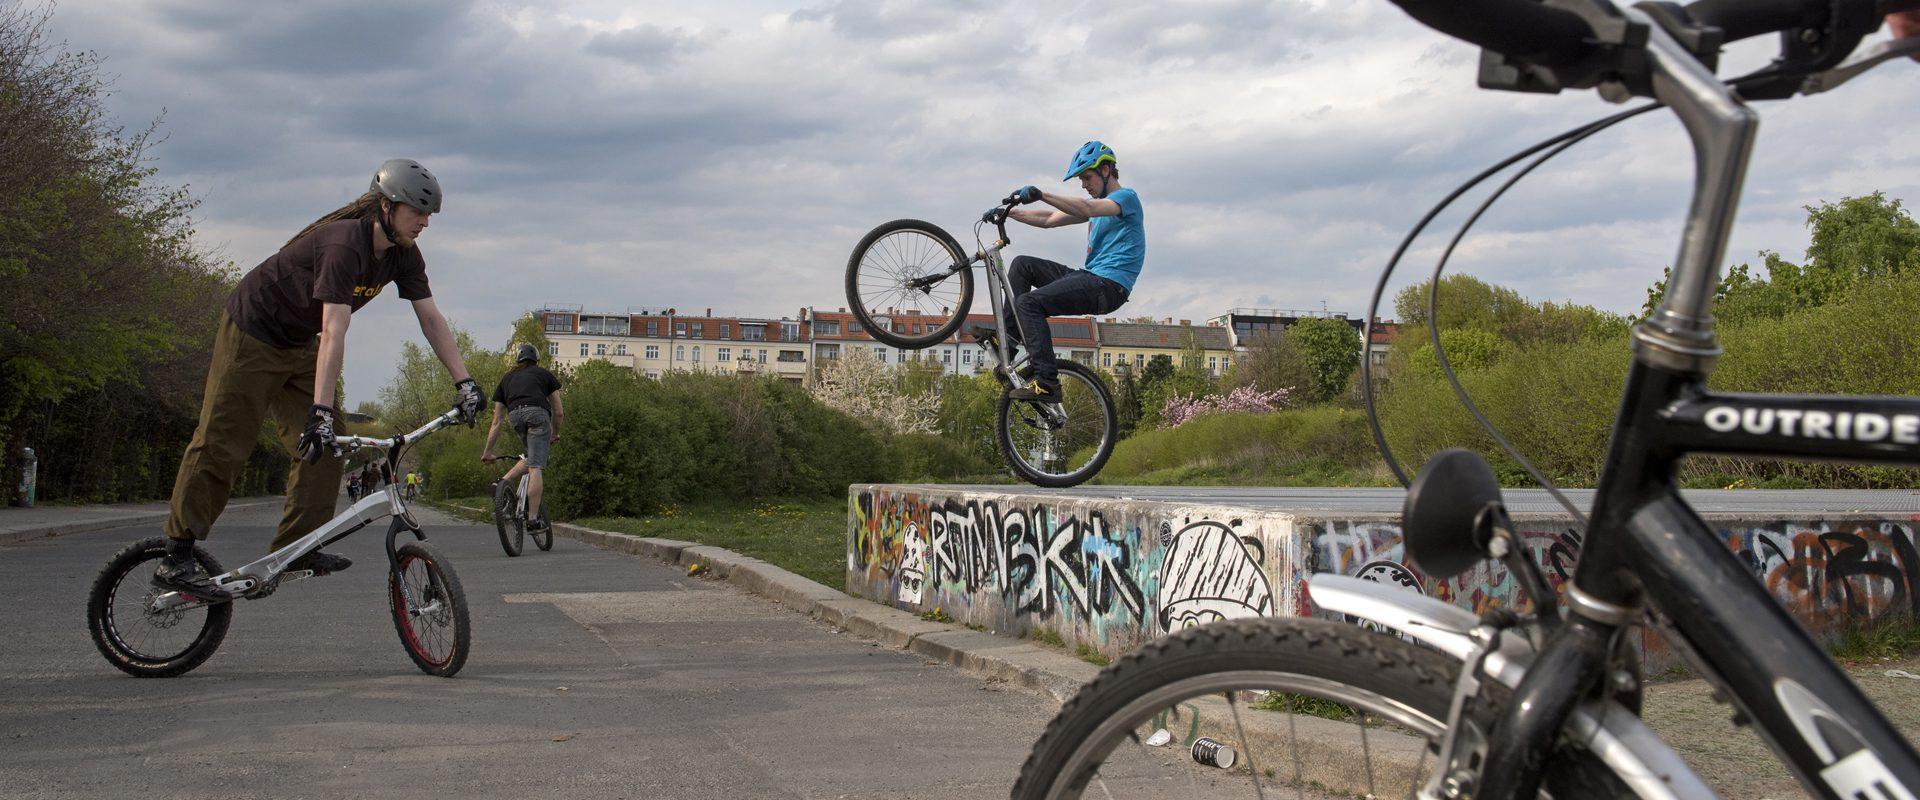 Berlin, Mauerpark. Foto: Erik-Jan Ouwerkerk